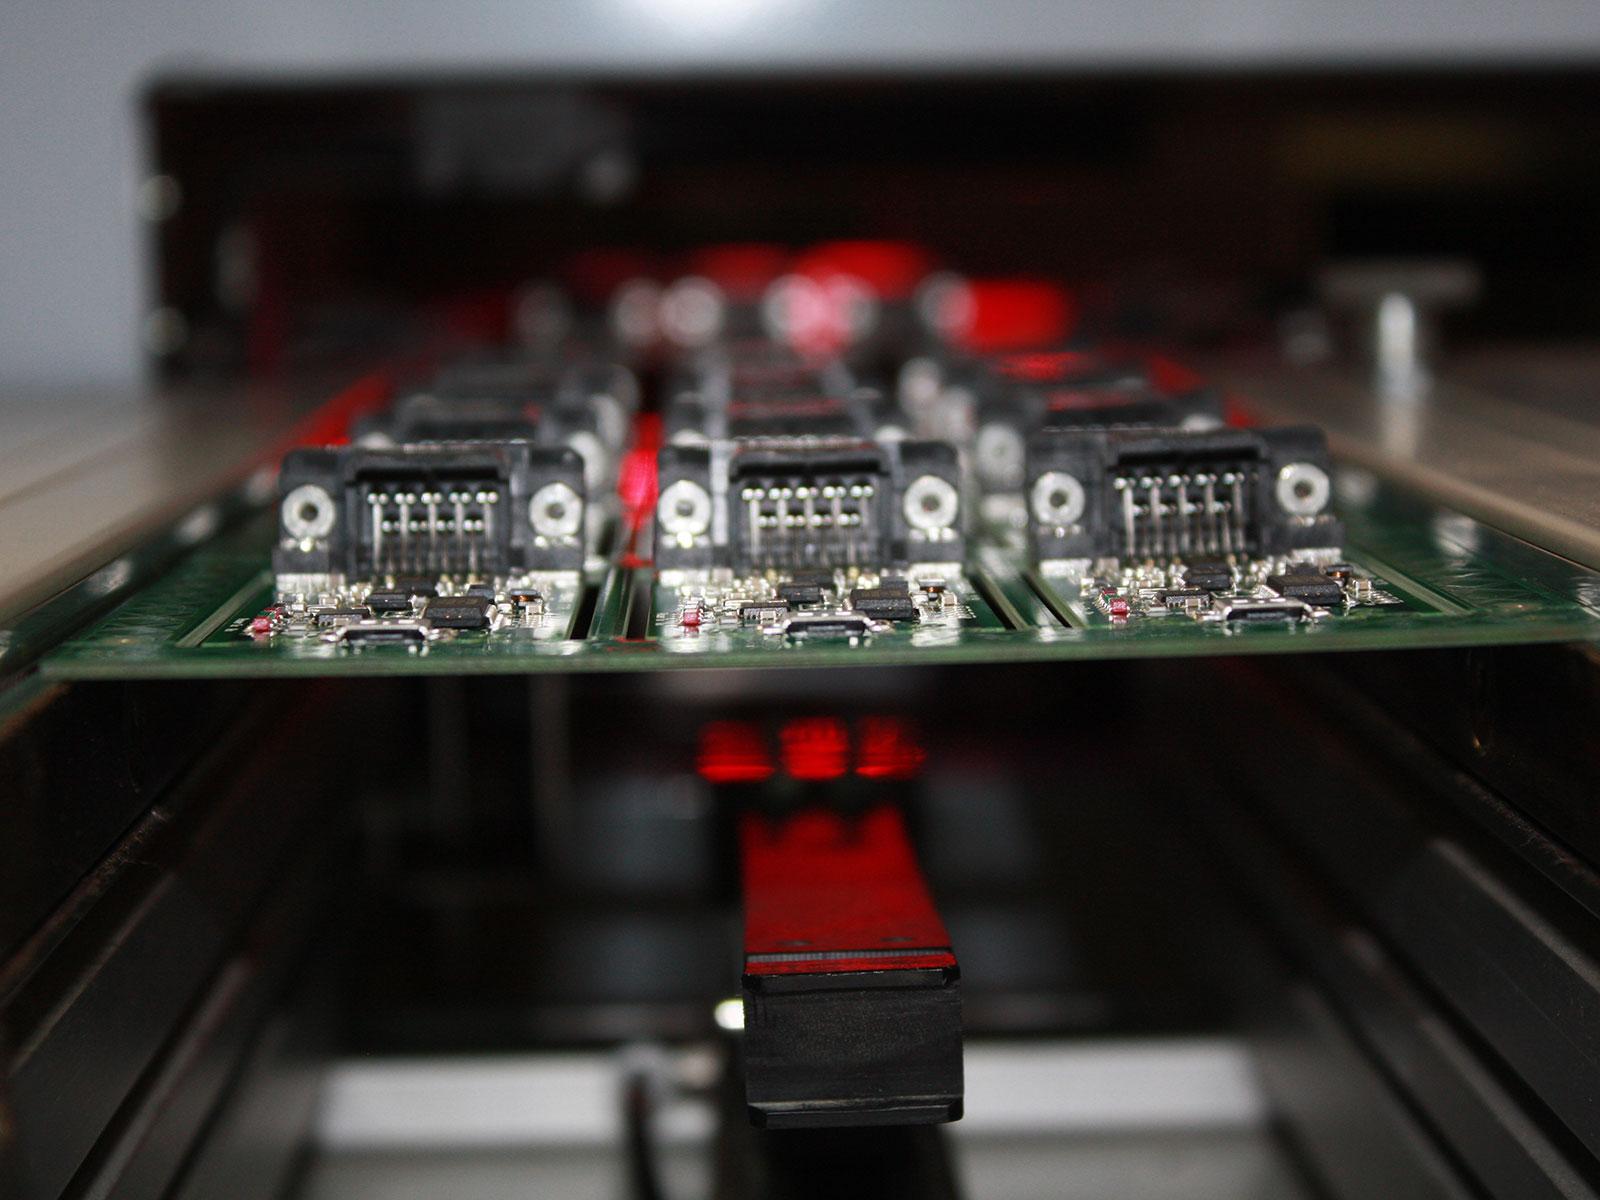 Broadweigh circuit boards